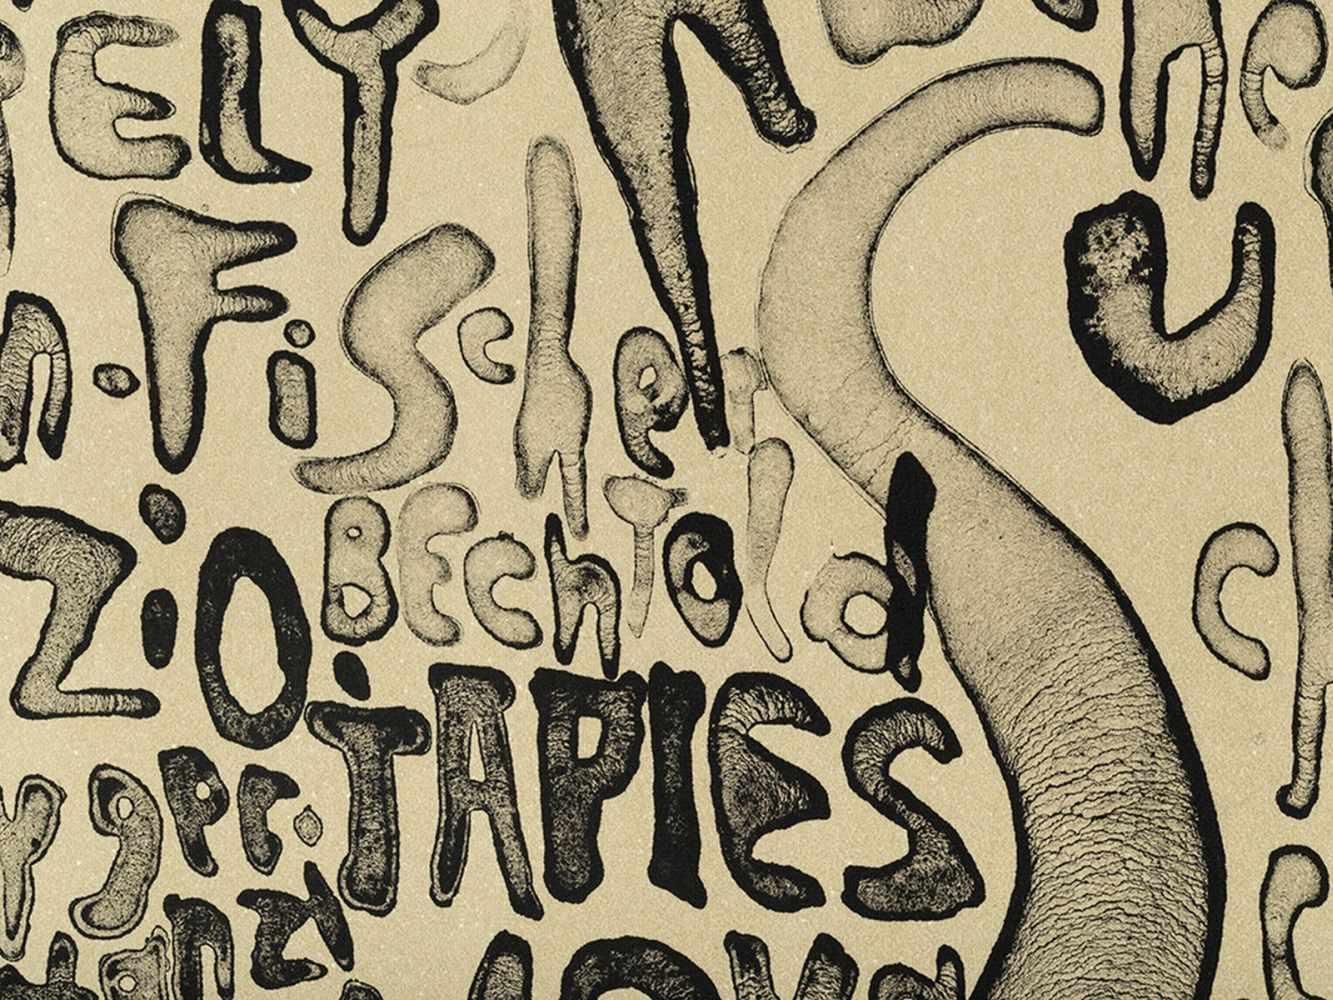 Paul Wunderlich, Kunst + Knoll International, Poster, 1963 - Image 7 of 9